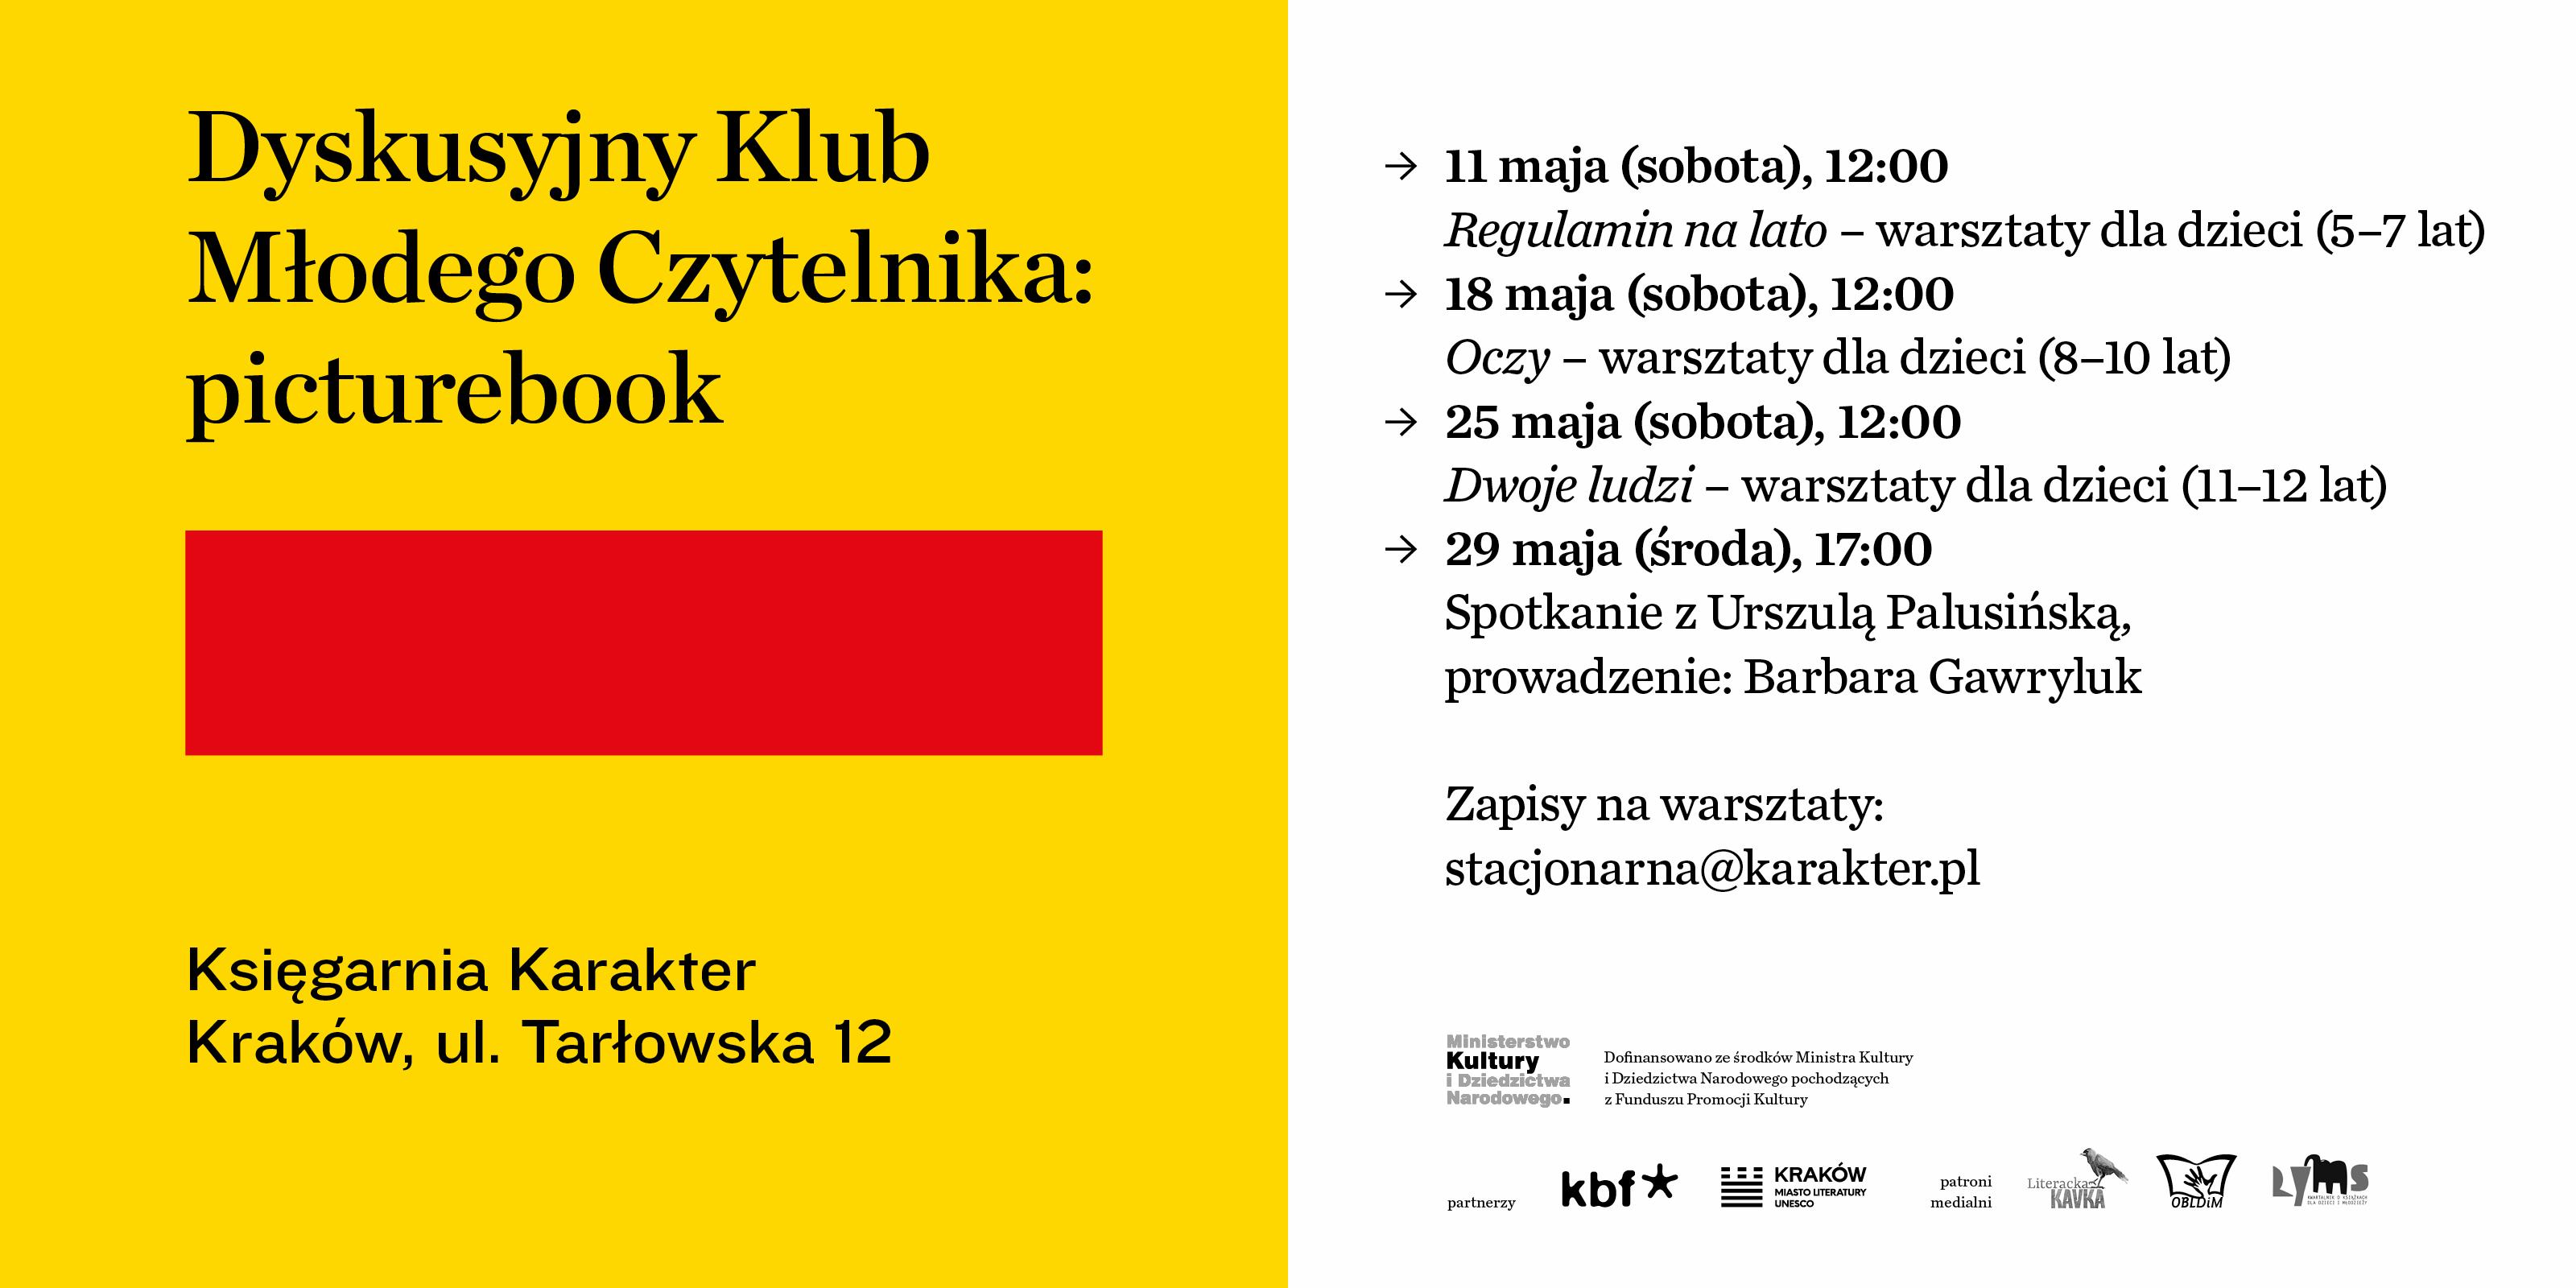 KK-FB-haslo-2019-05-DKMC-dla_partnerow